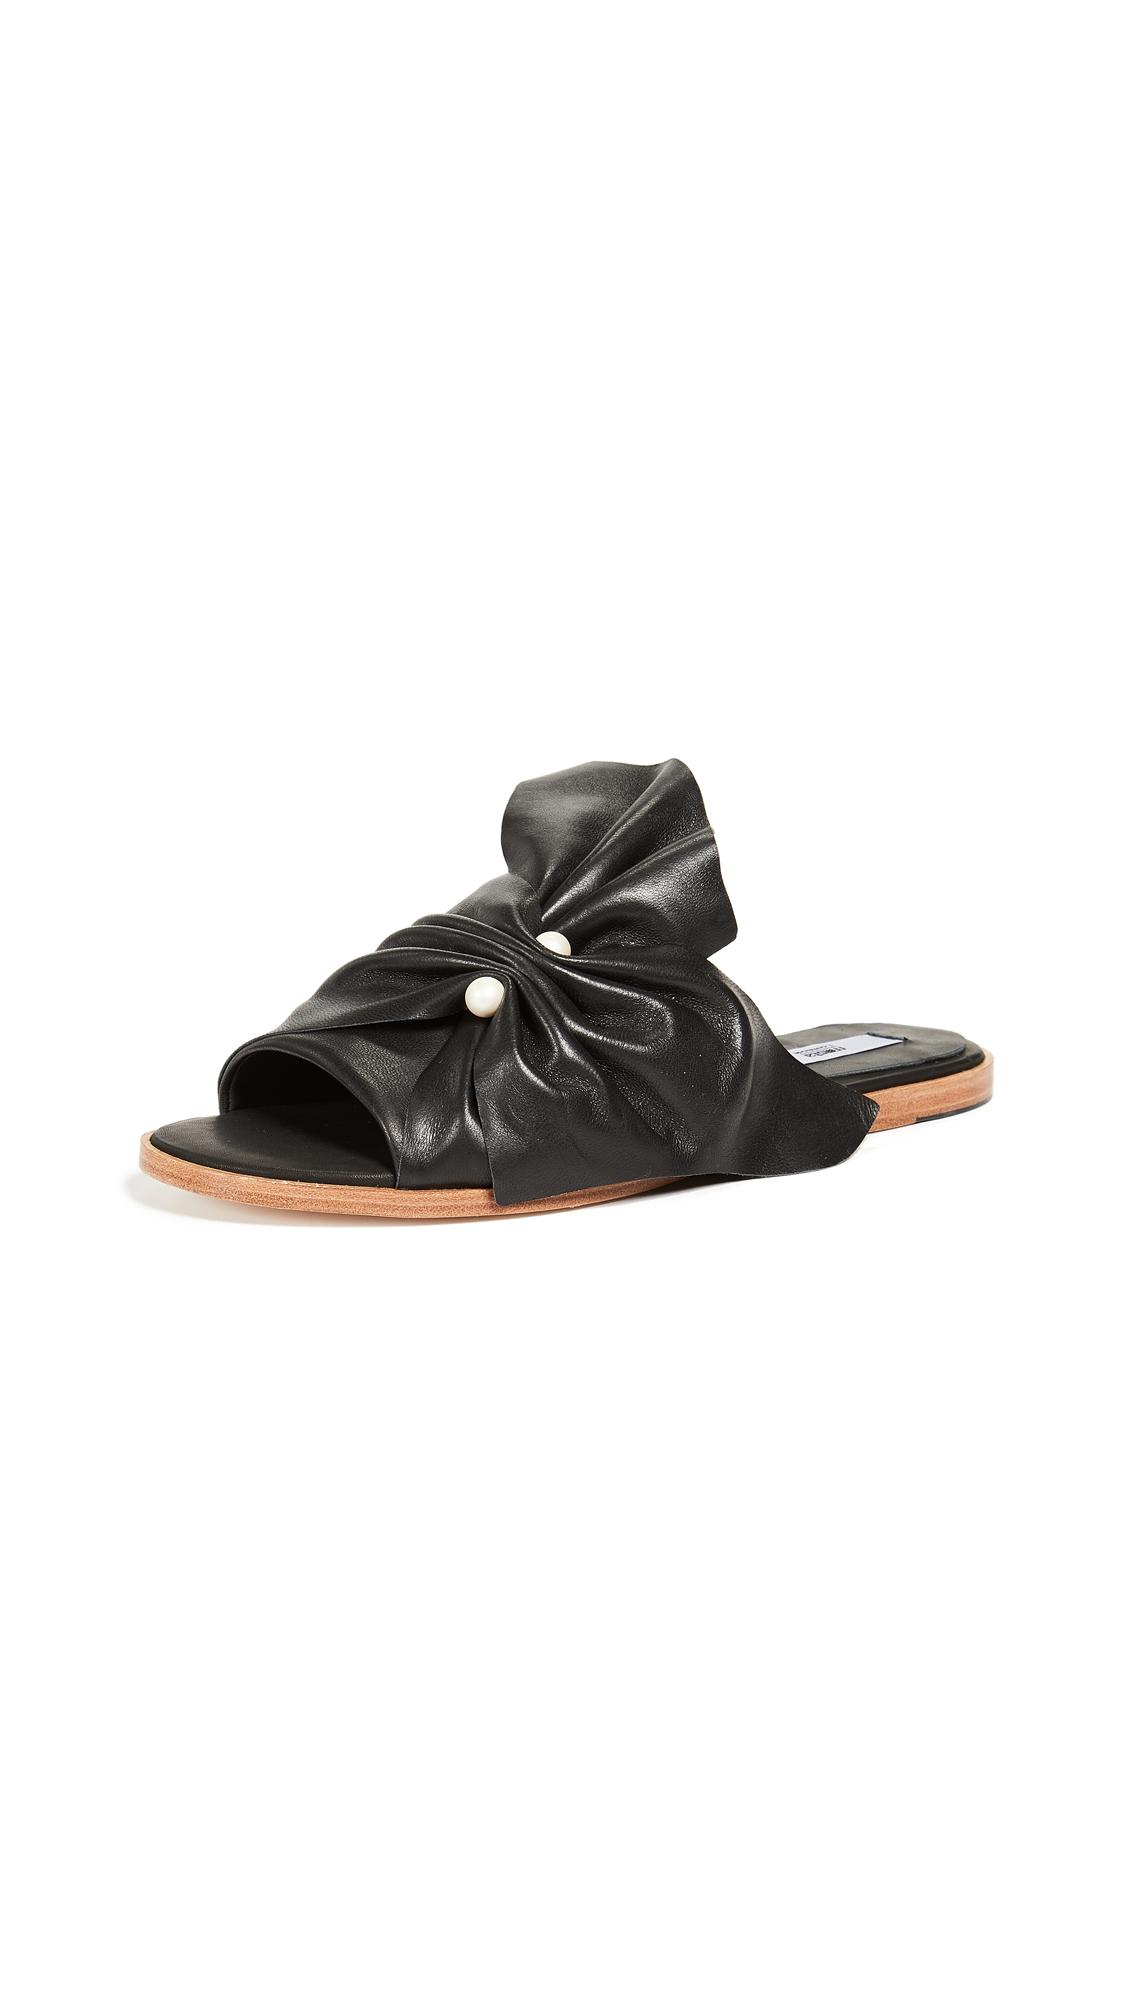 Miista Carina Sandals - Black